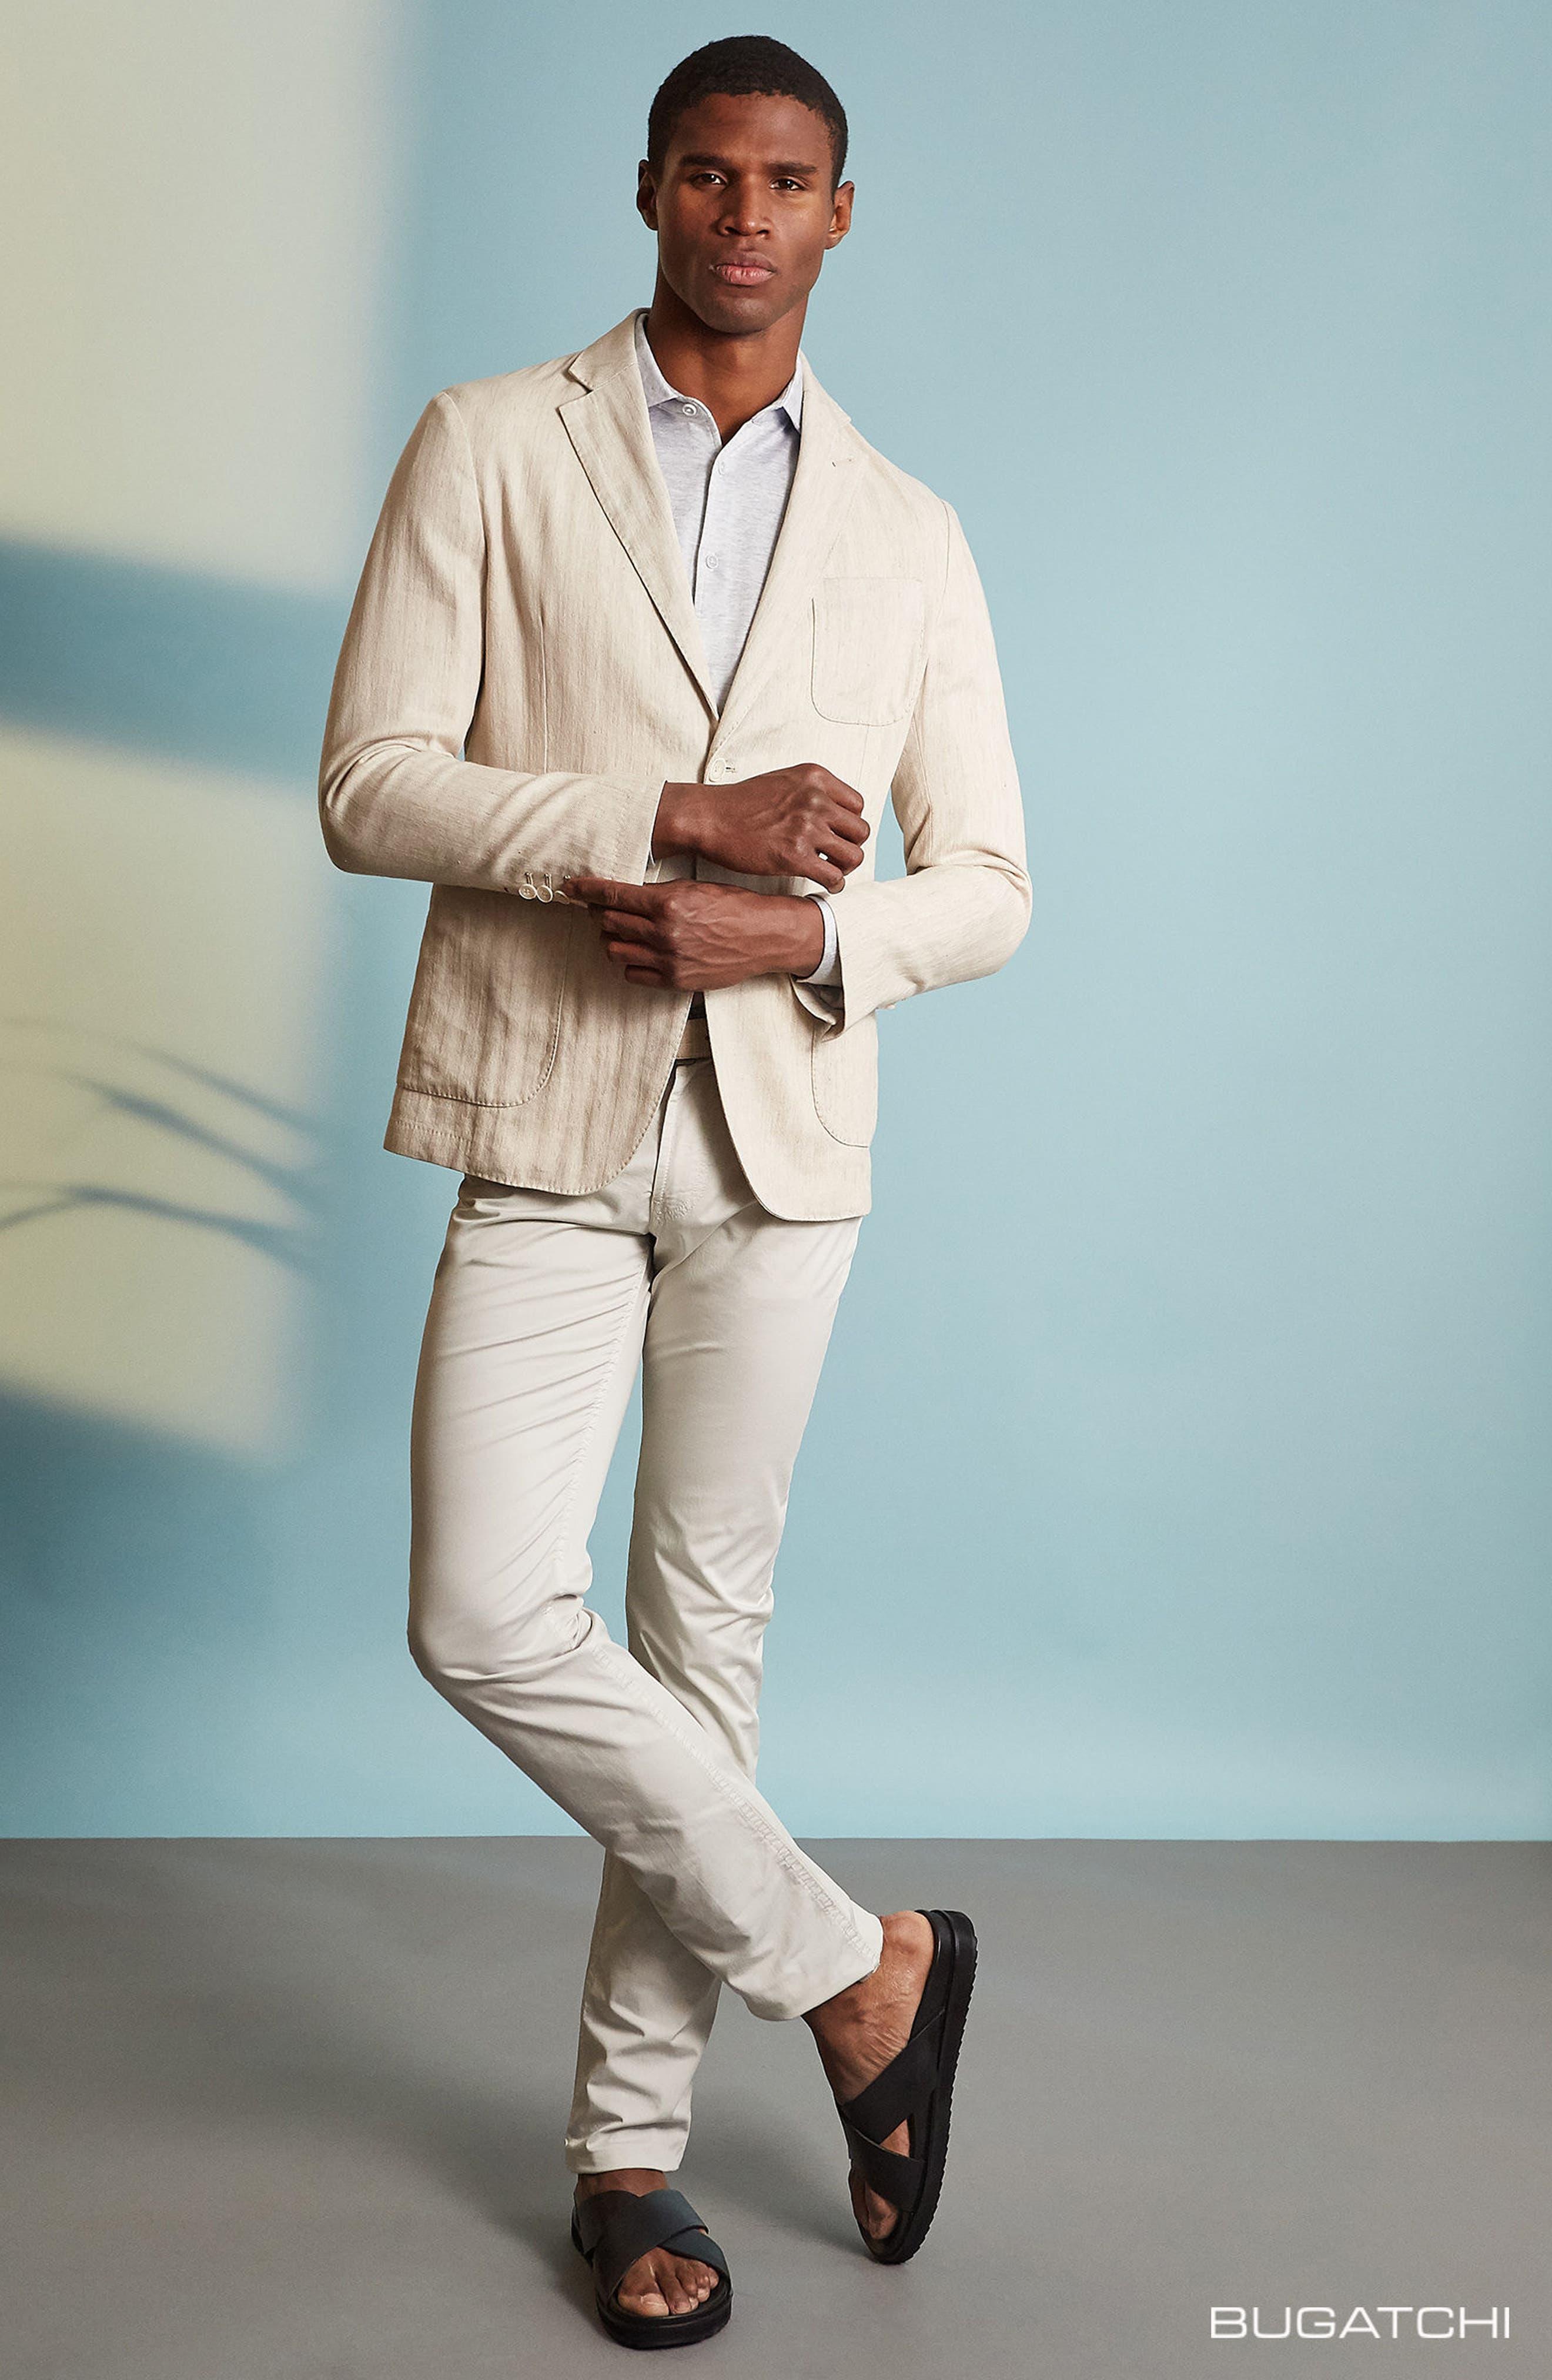 Regular Fit Herringbone Cotton & Linen Blazer,                             Alternate thumbnail 10, color,                             200